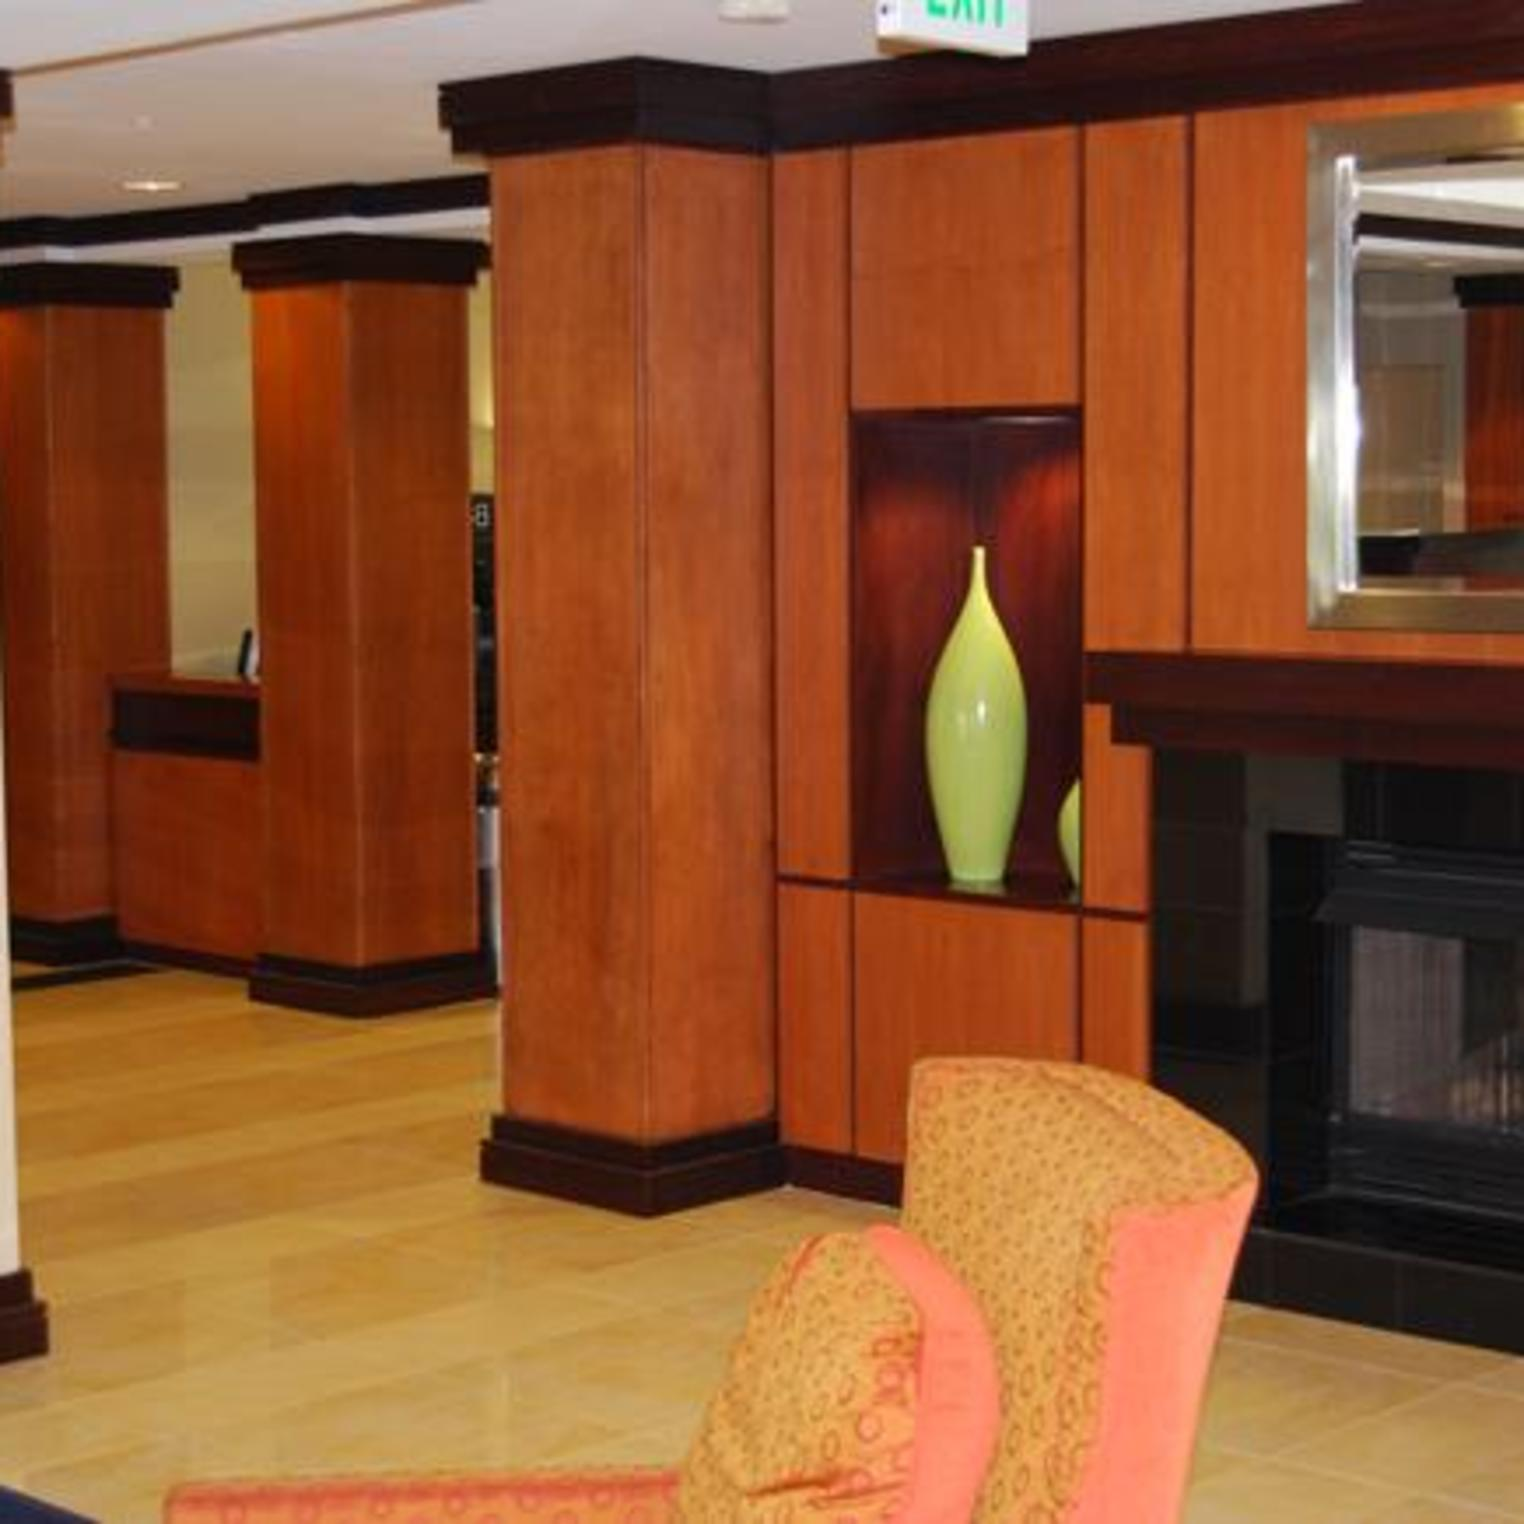 Fairfield Inn & Suites Carlisle lobby view